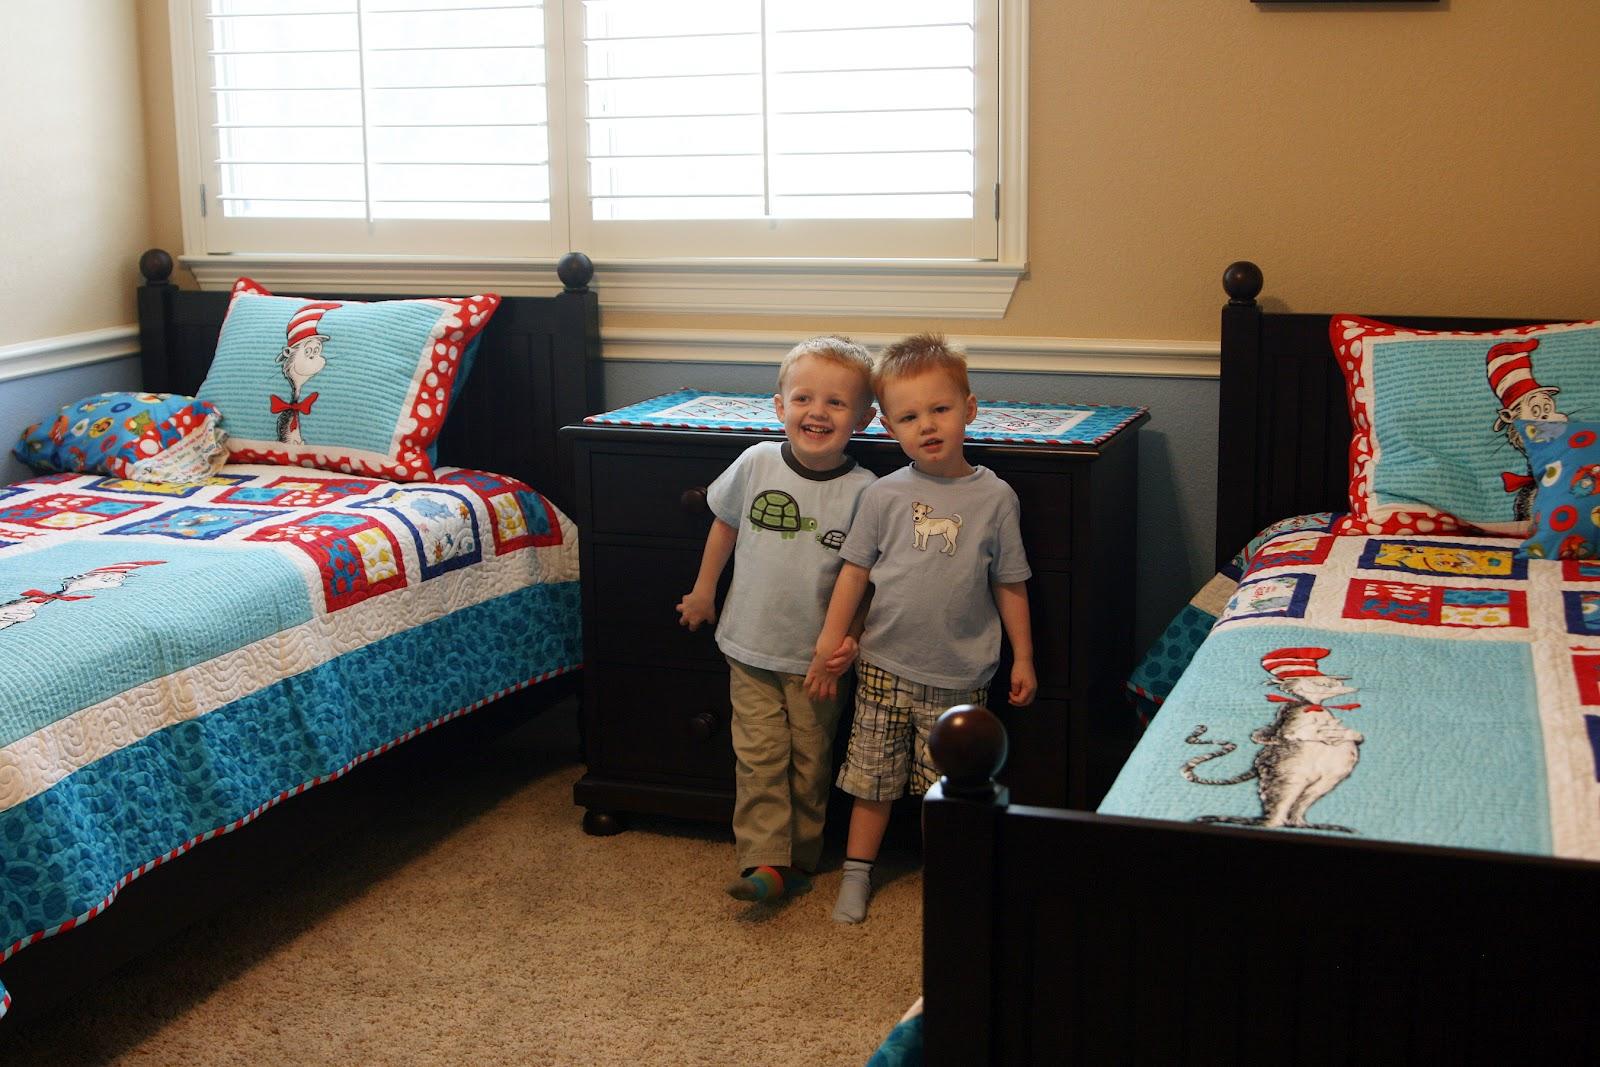 Fat Quarter Shop's Jolly Jabber: The Twins' Bedroom Tour